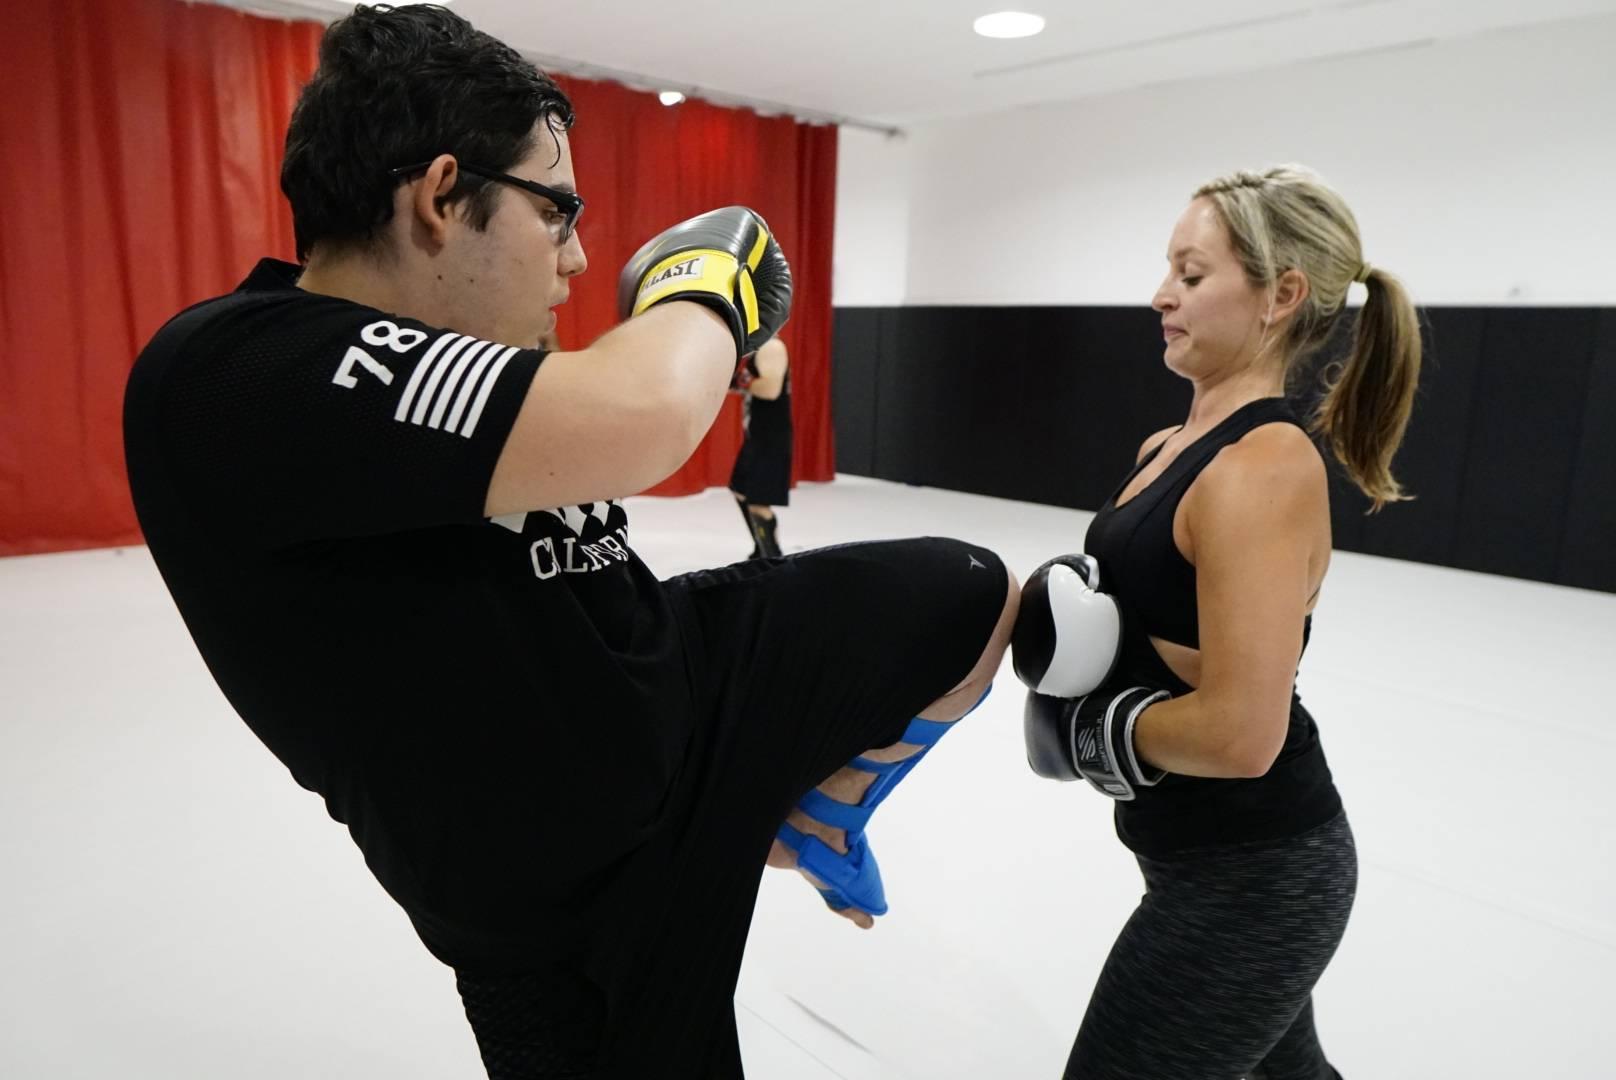 man and woman practicing muay thai kicks